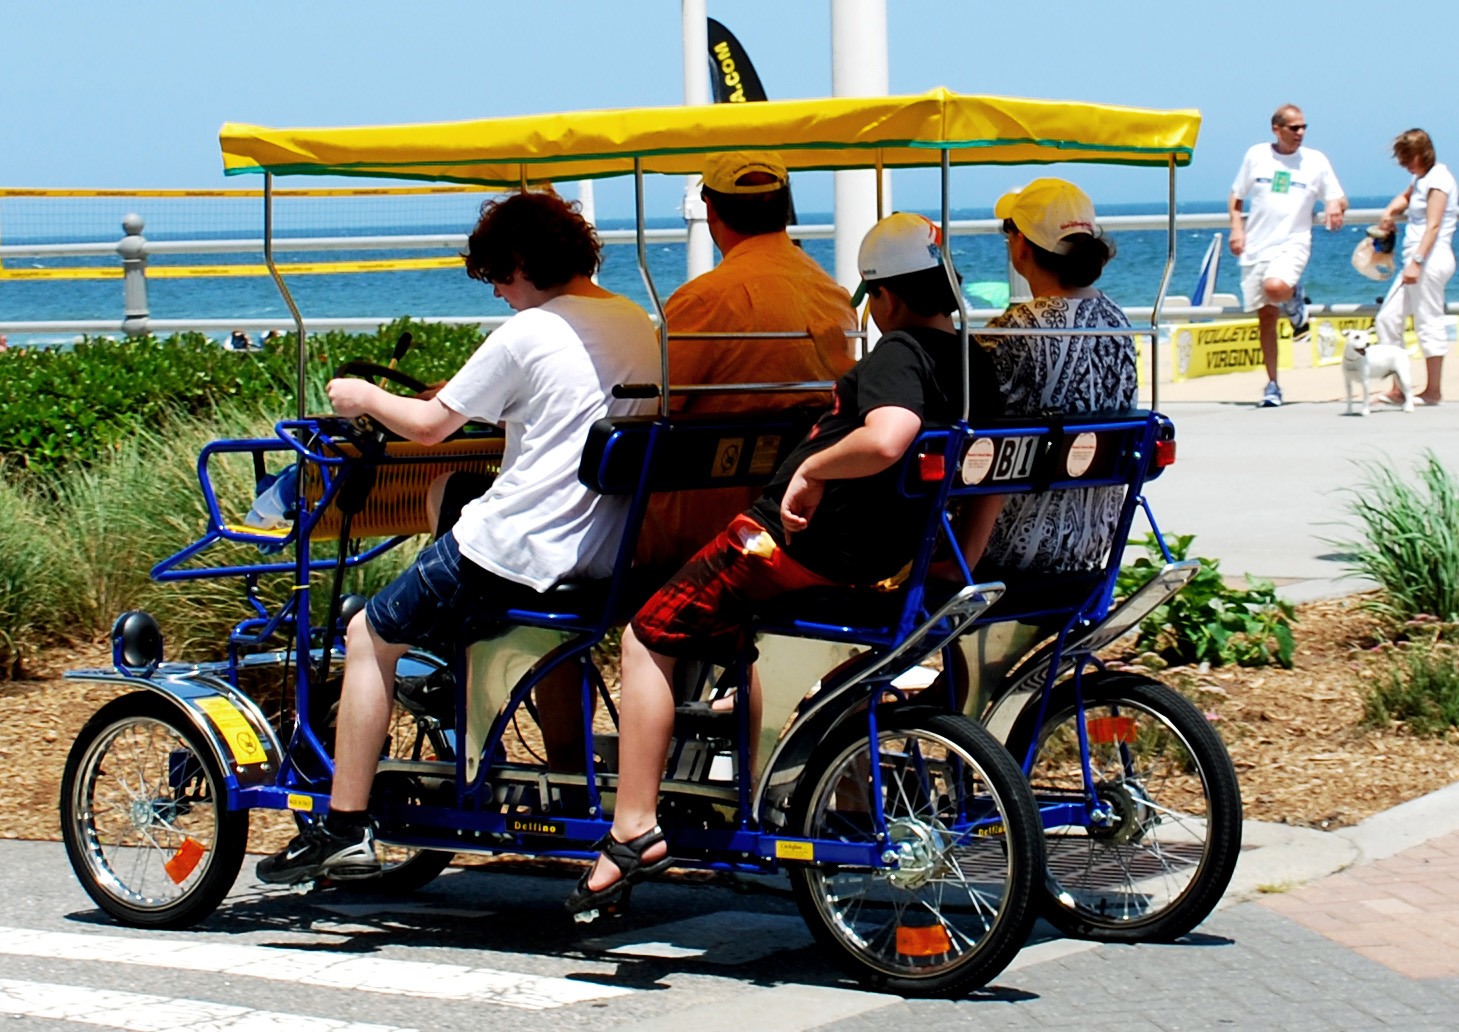 Bikes Virginia Beach Surrey Rental Related Keywords